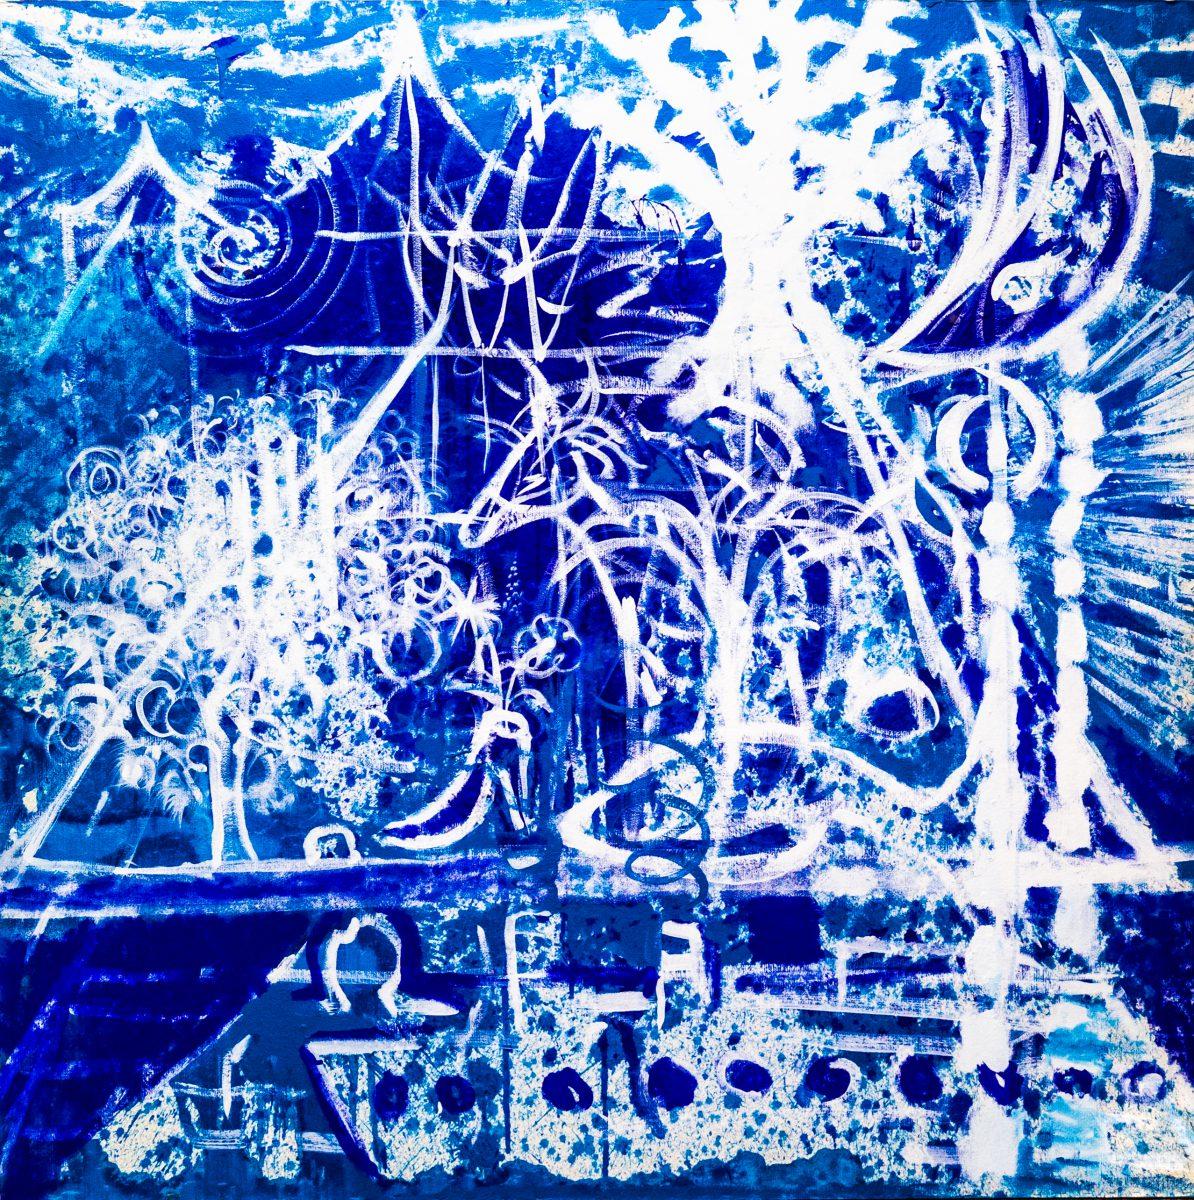 028_Slumberland, Acryl auf Zellstoff, 182 x 182 cm, 2010